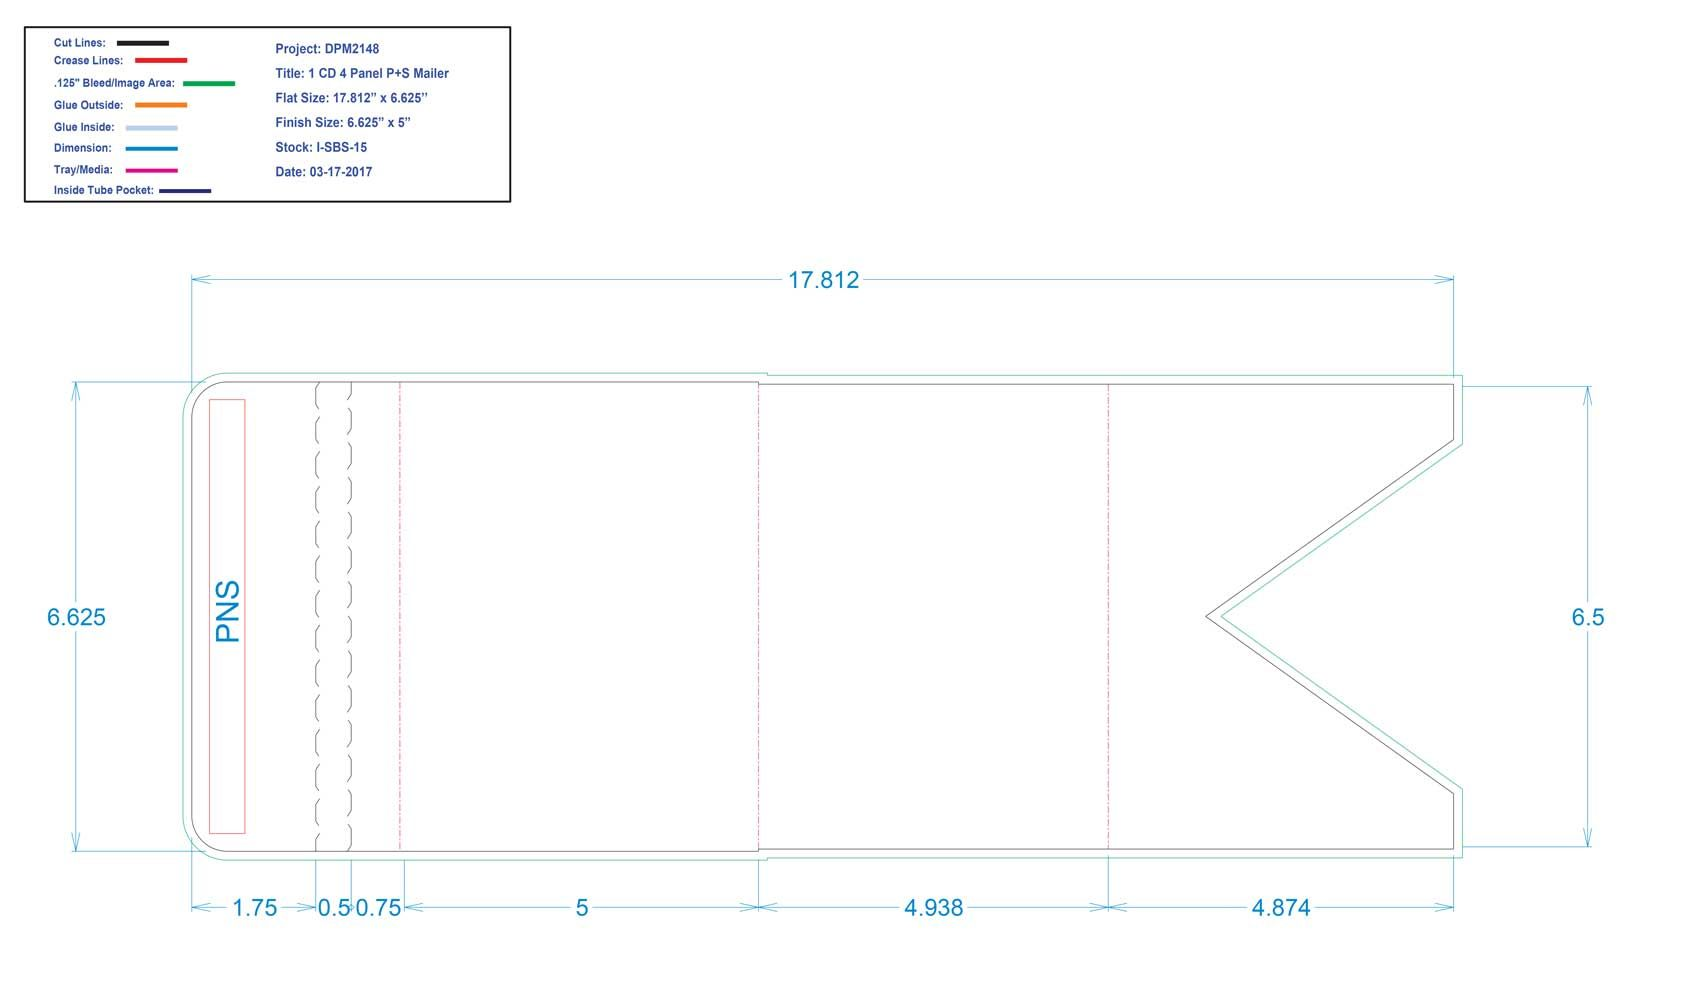 DPM2148 4 panel One CD P+S Mailer